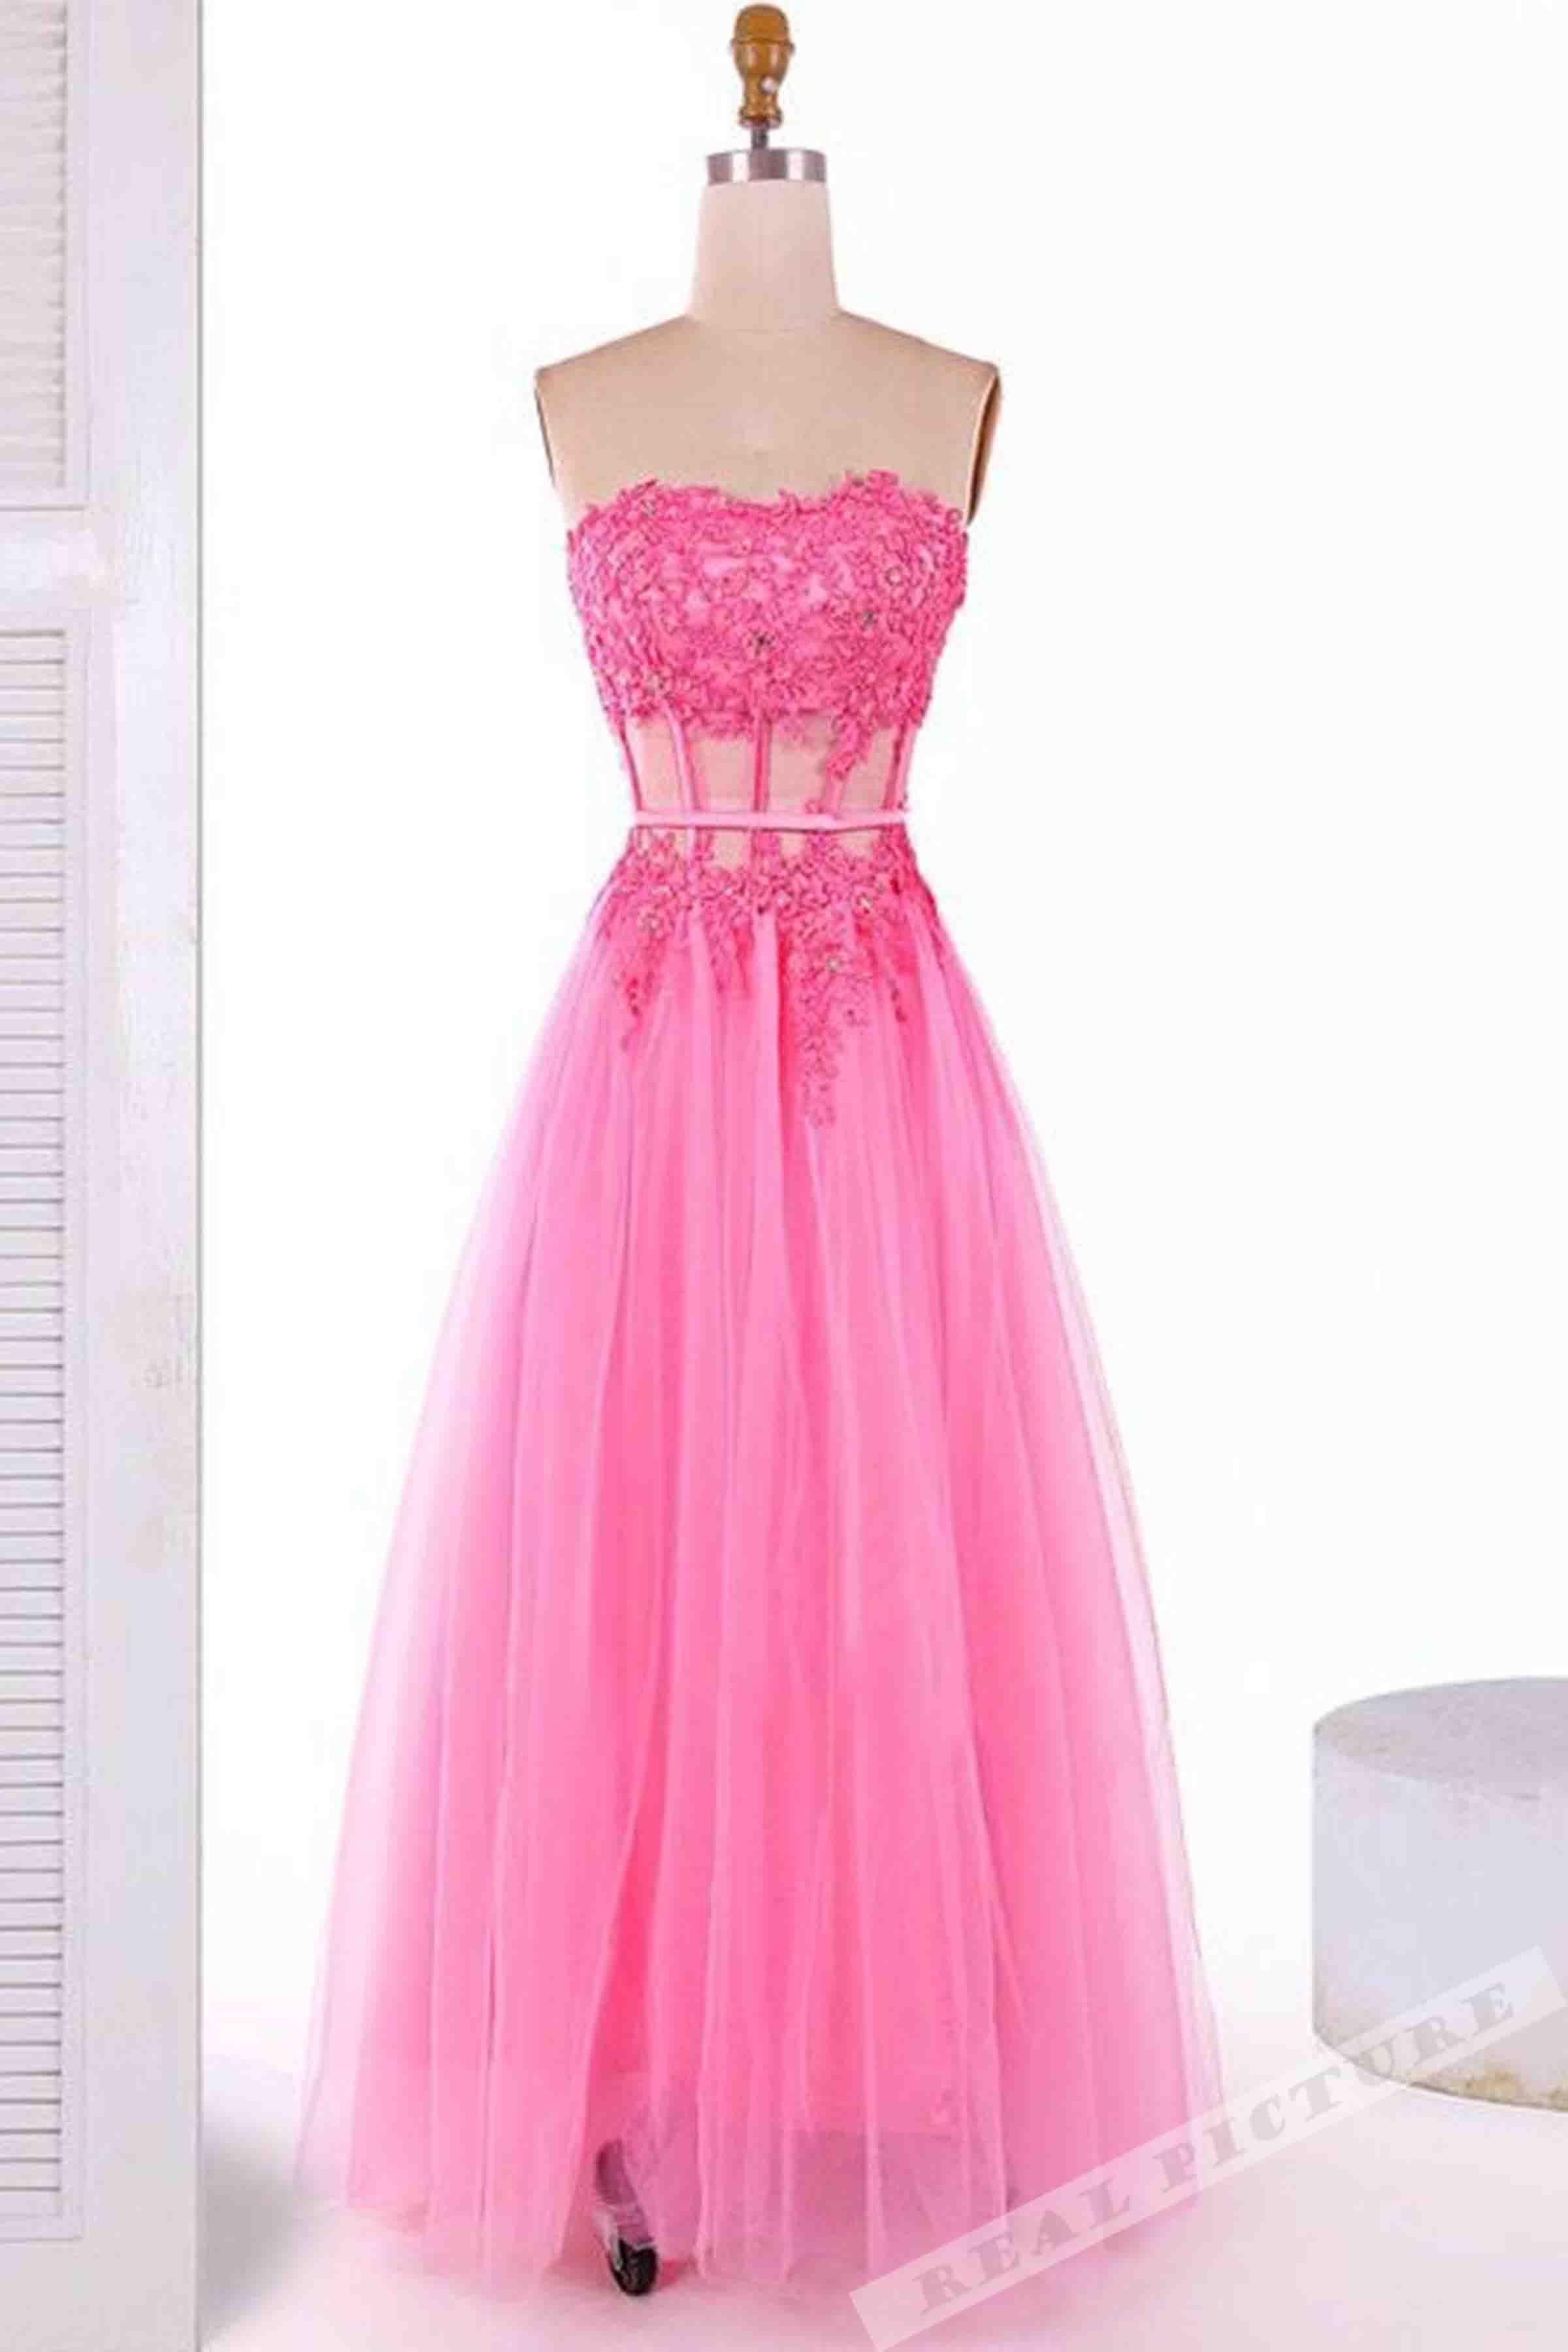 Pink tulle sweetheart lace applique princess long dresscute dress